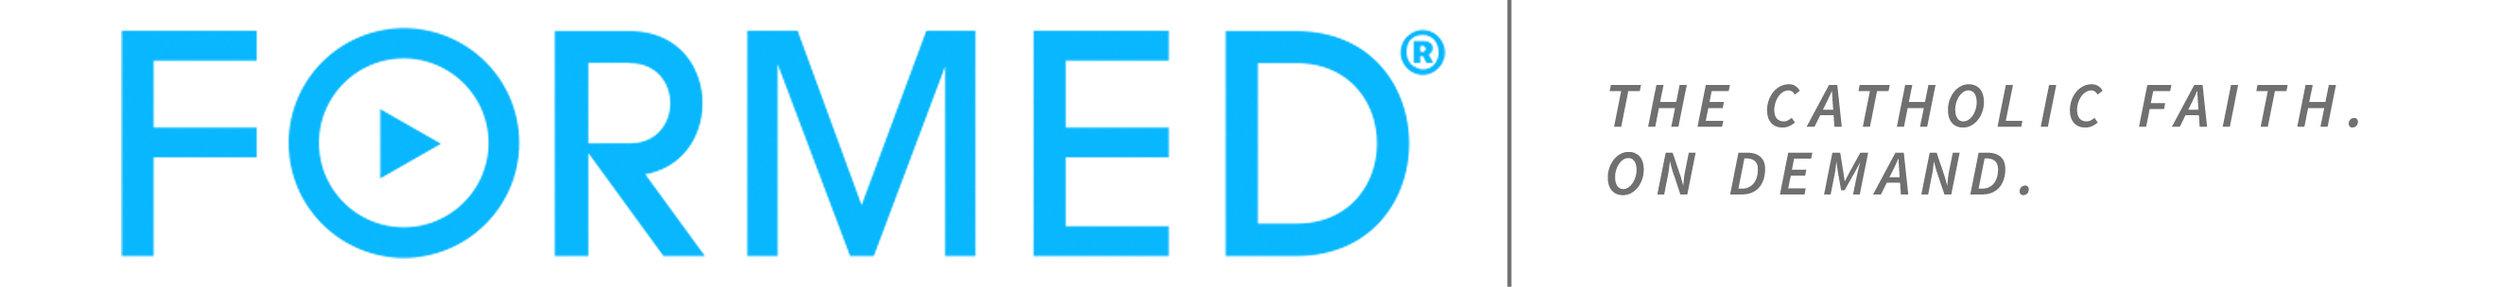 formed-logo-horizontal.jpg